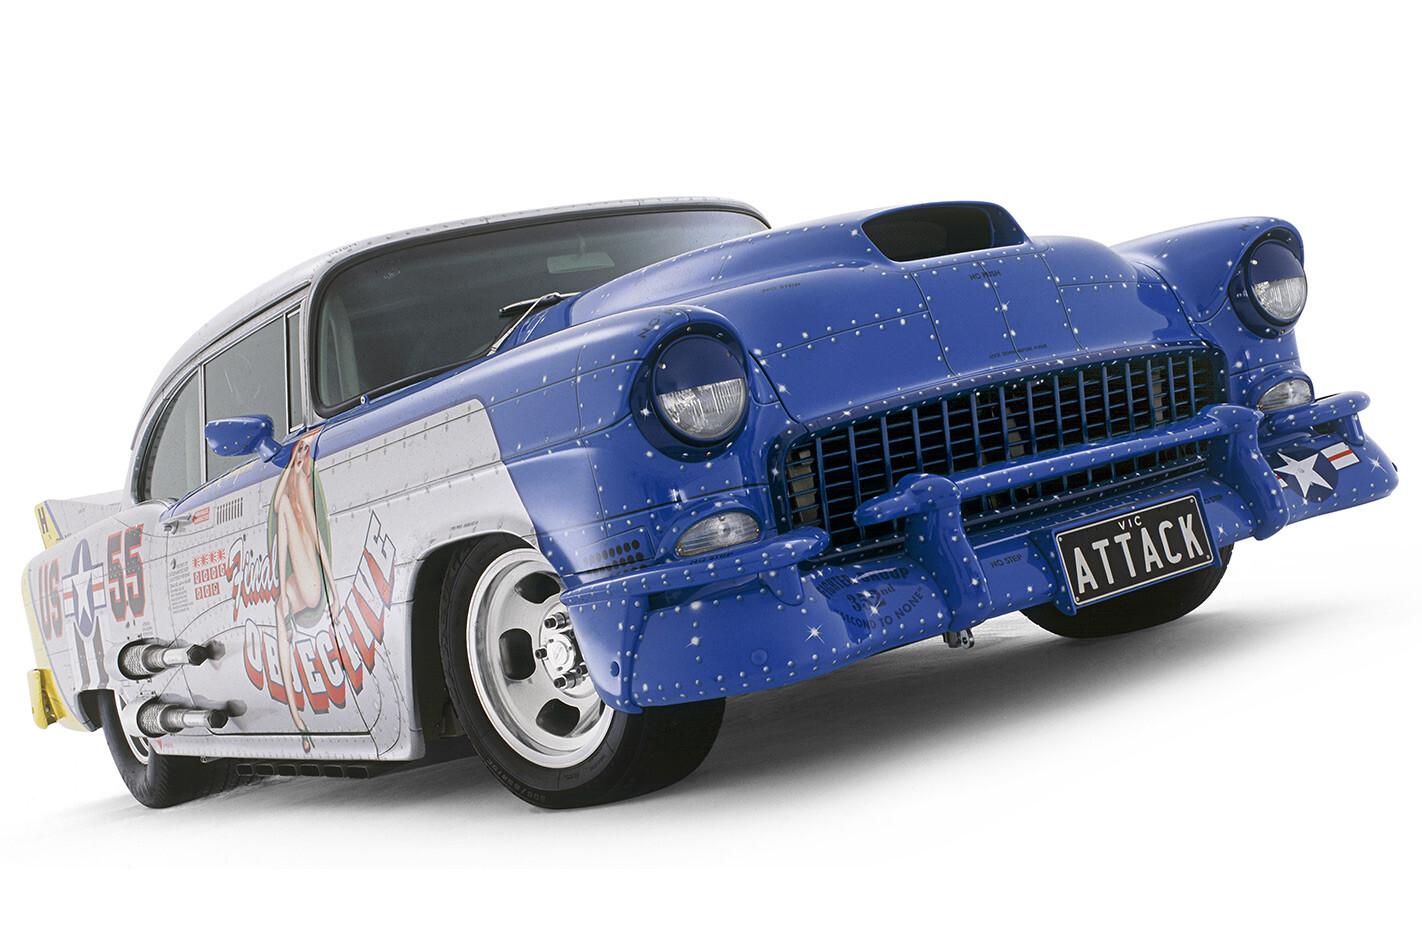 1955 Chevrolet Massive Attack front